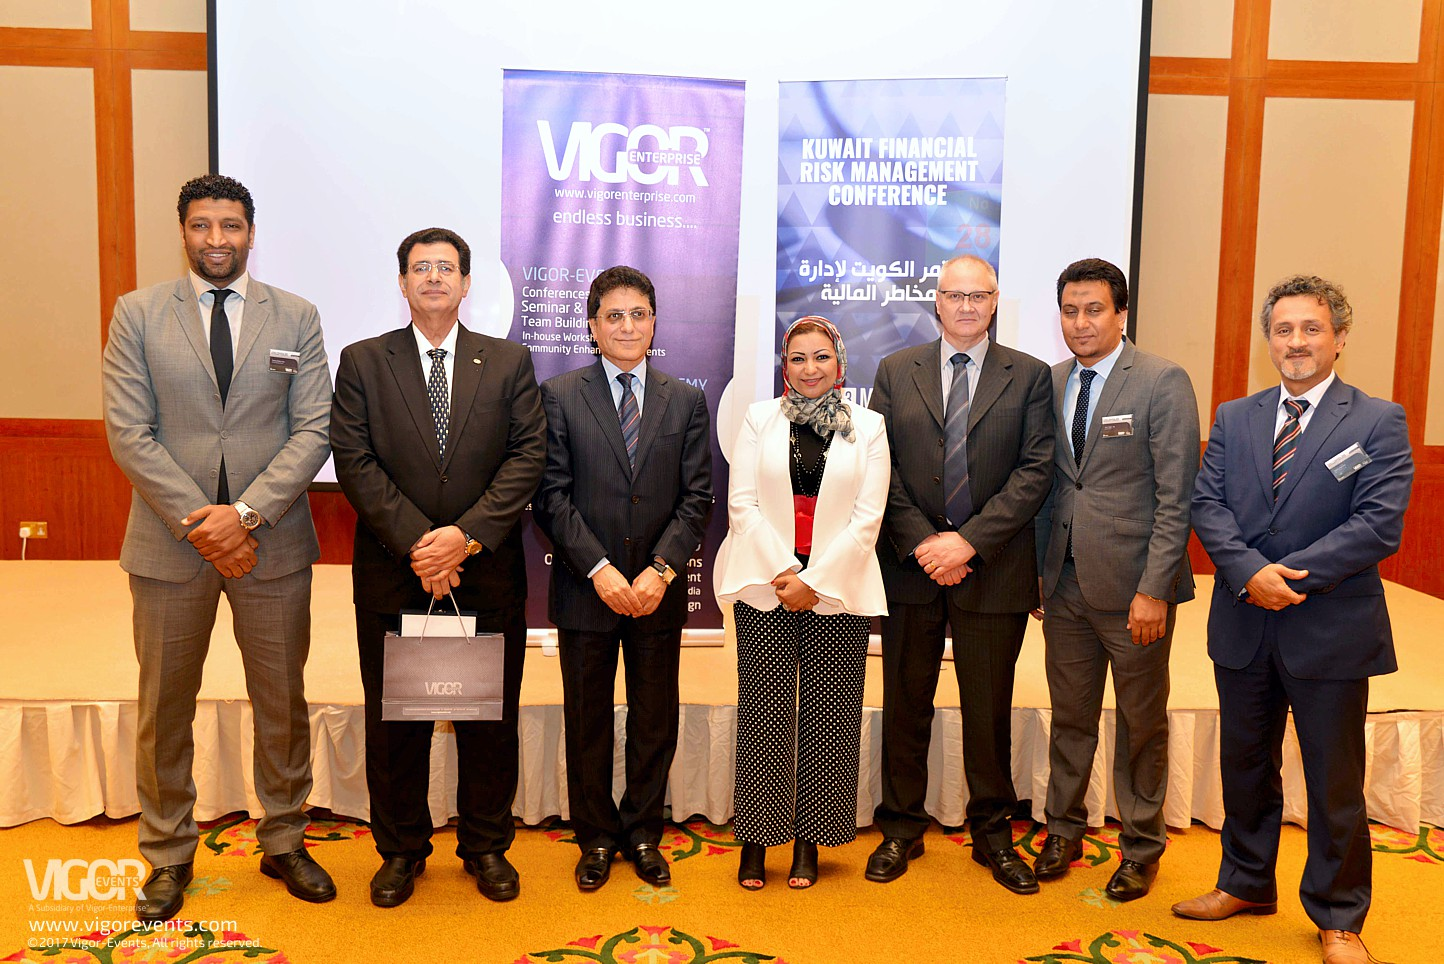 Financial Risk Management Conference